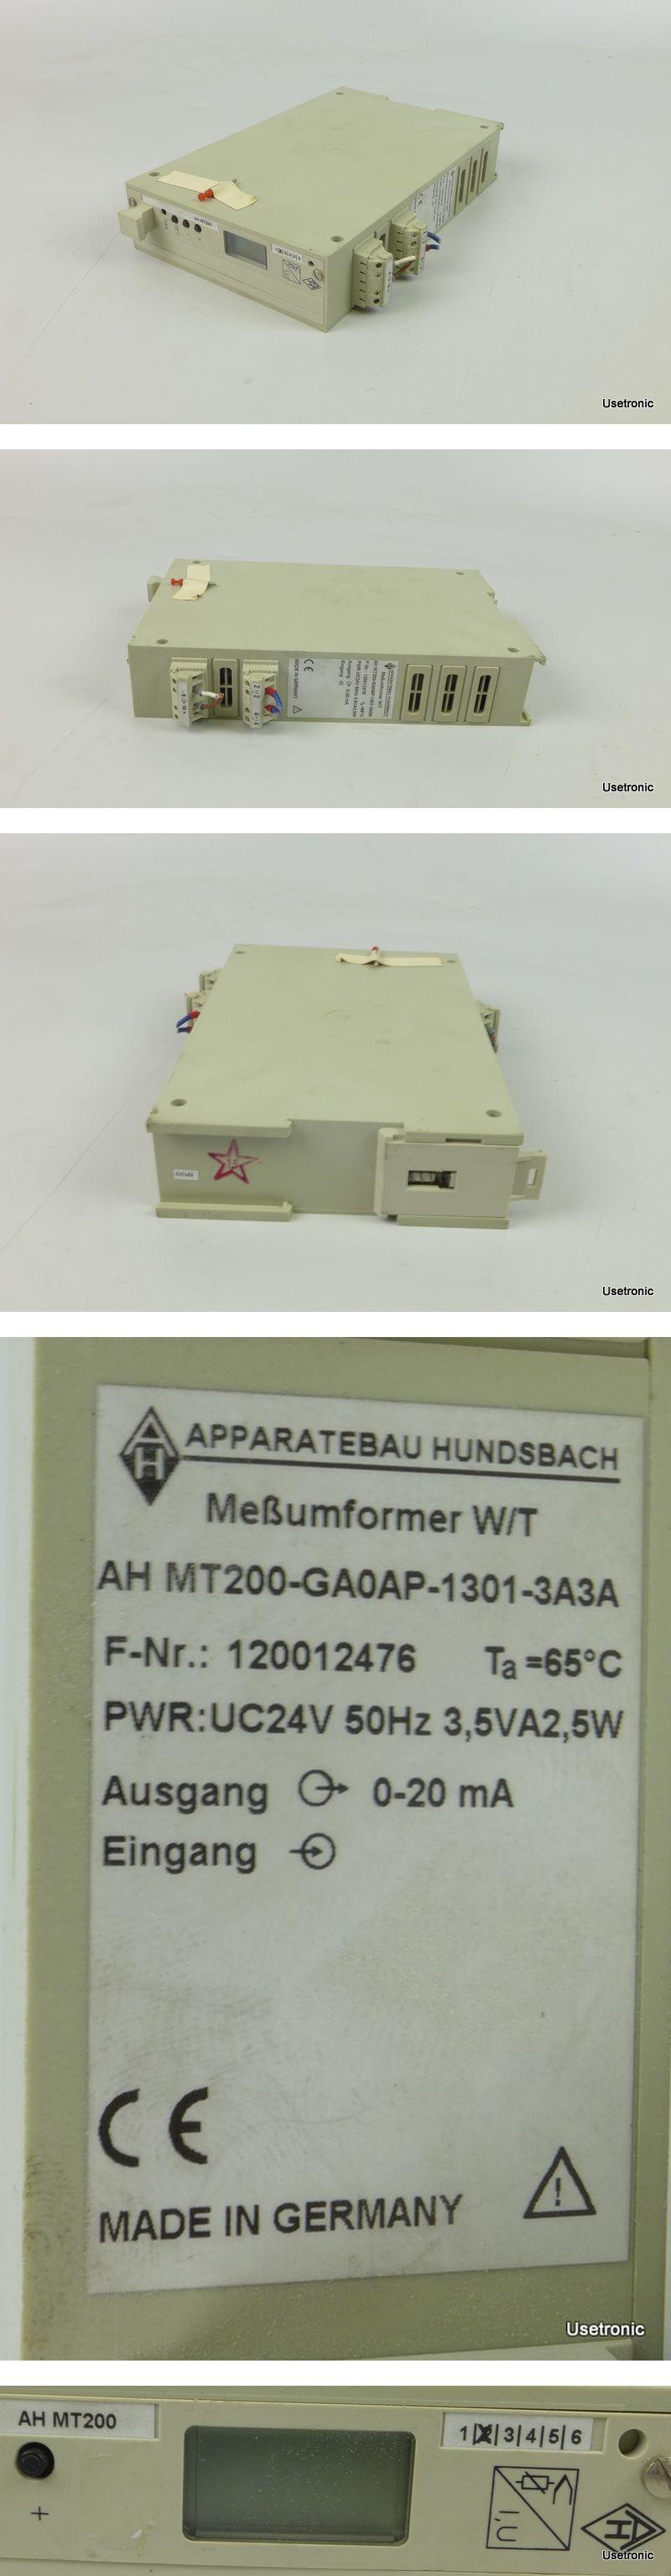 Apparatebau Hundsbach MT200-GA0AP-1301-3A3A